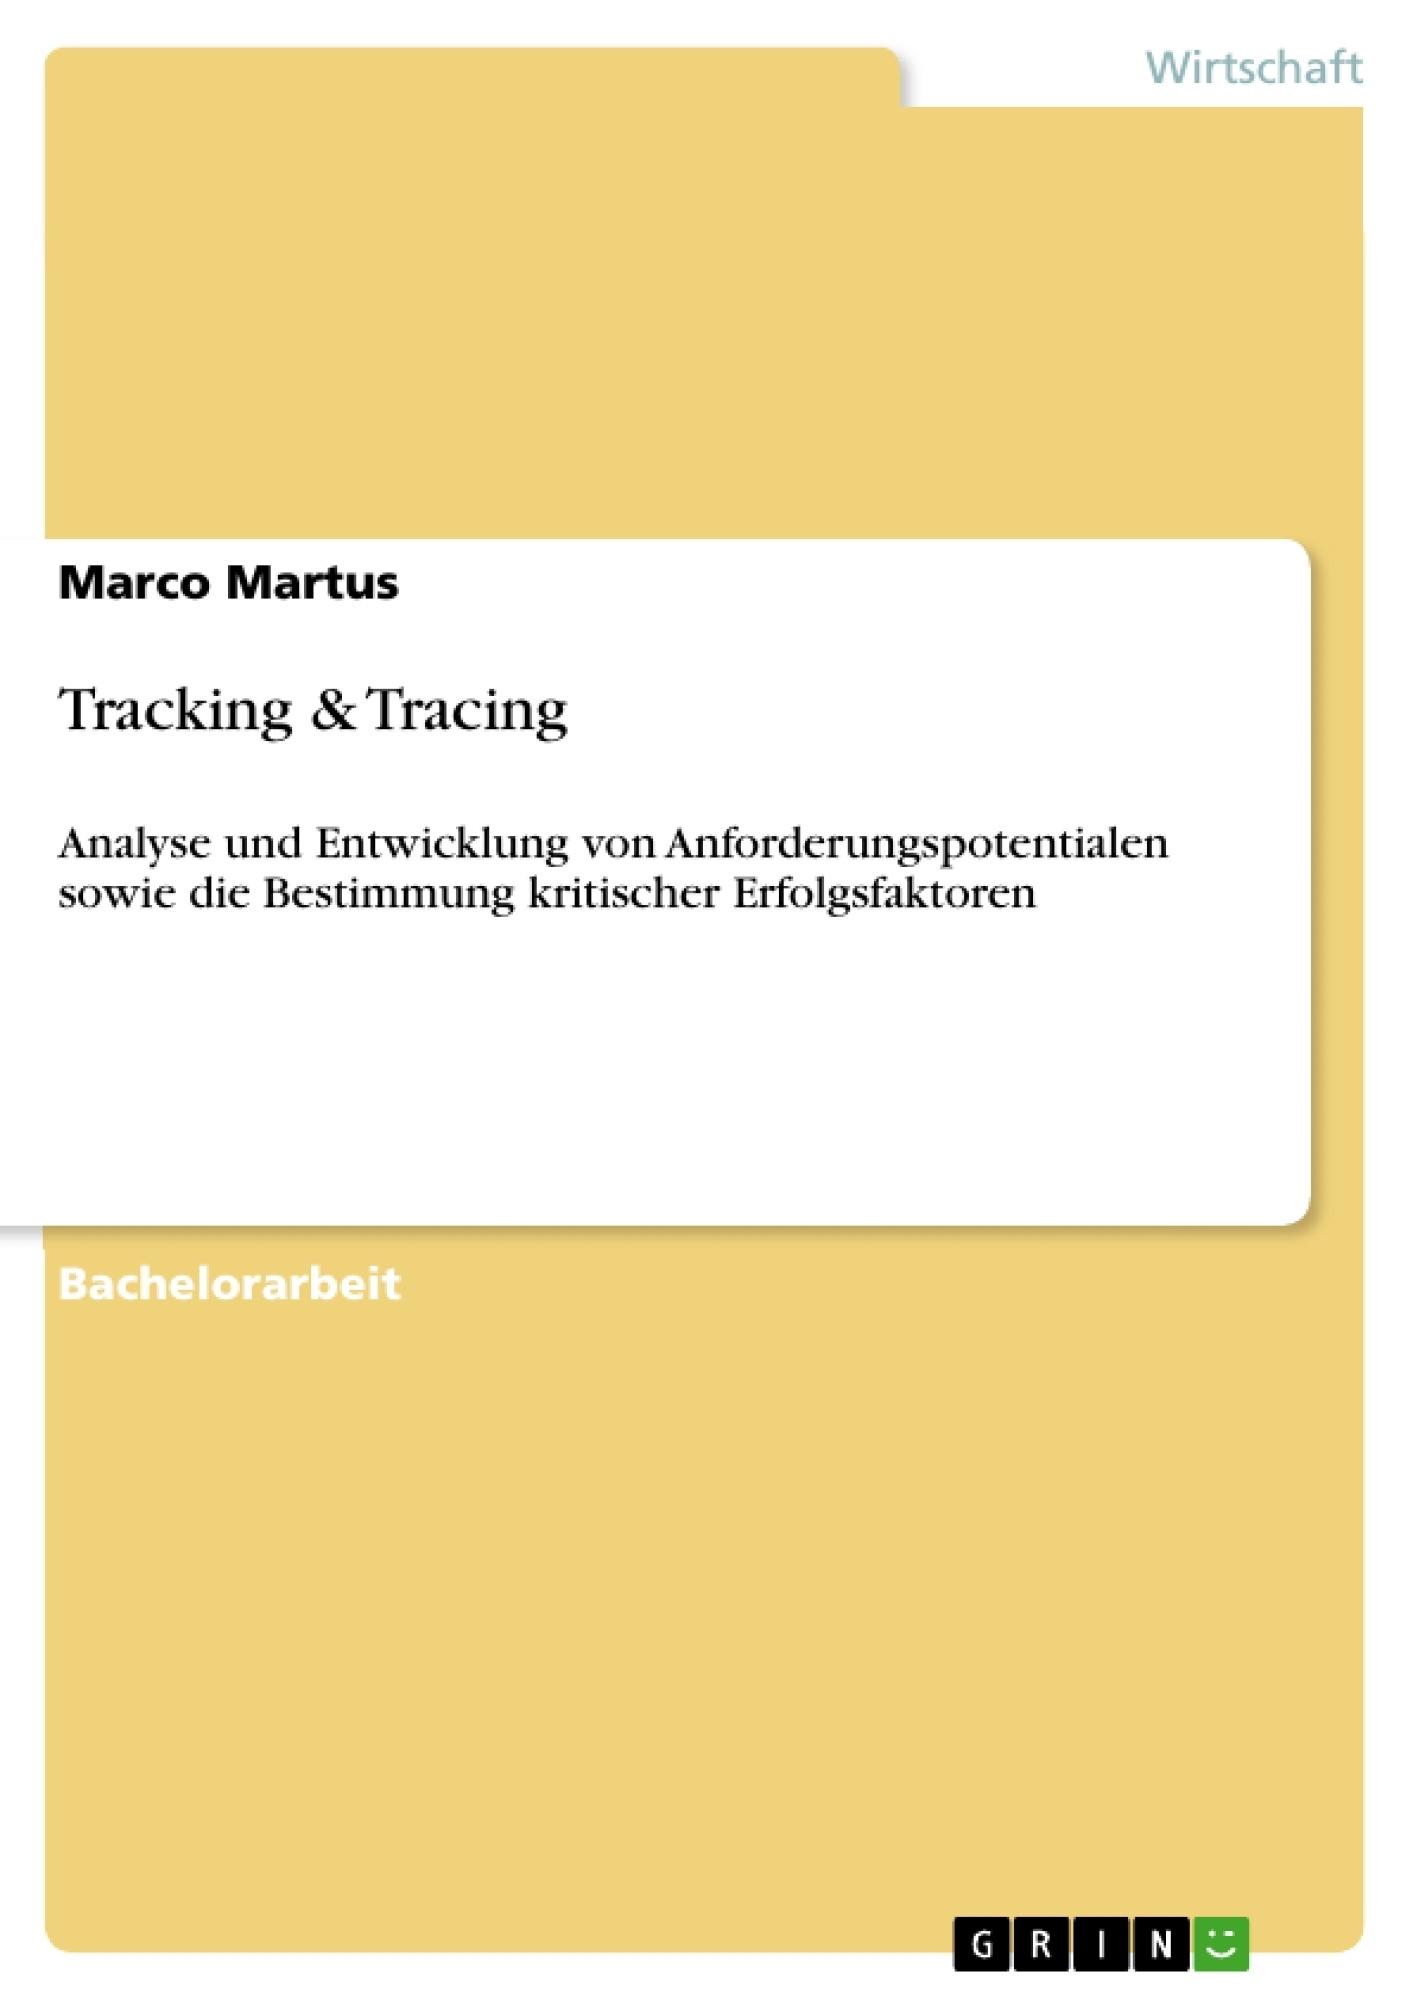 Titel: Tracking & Tracing